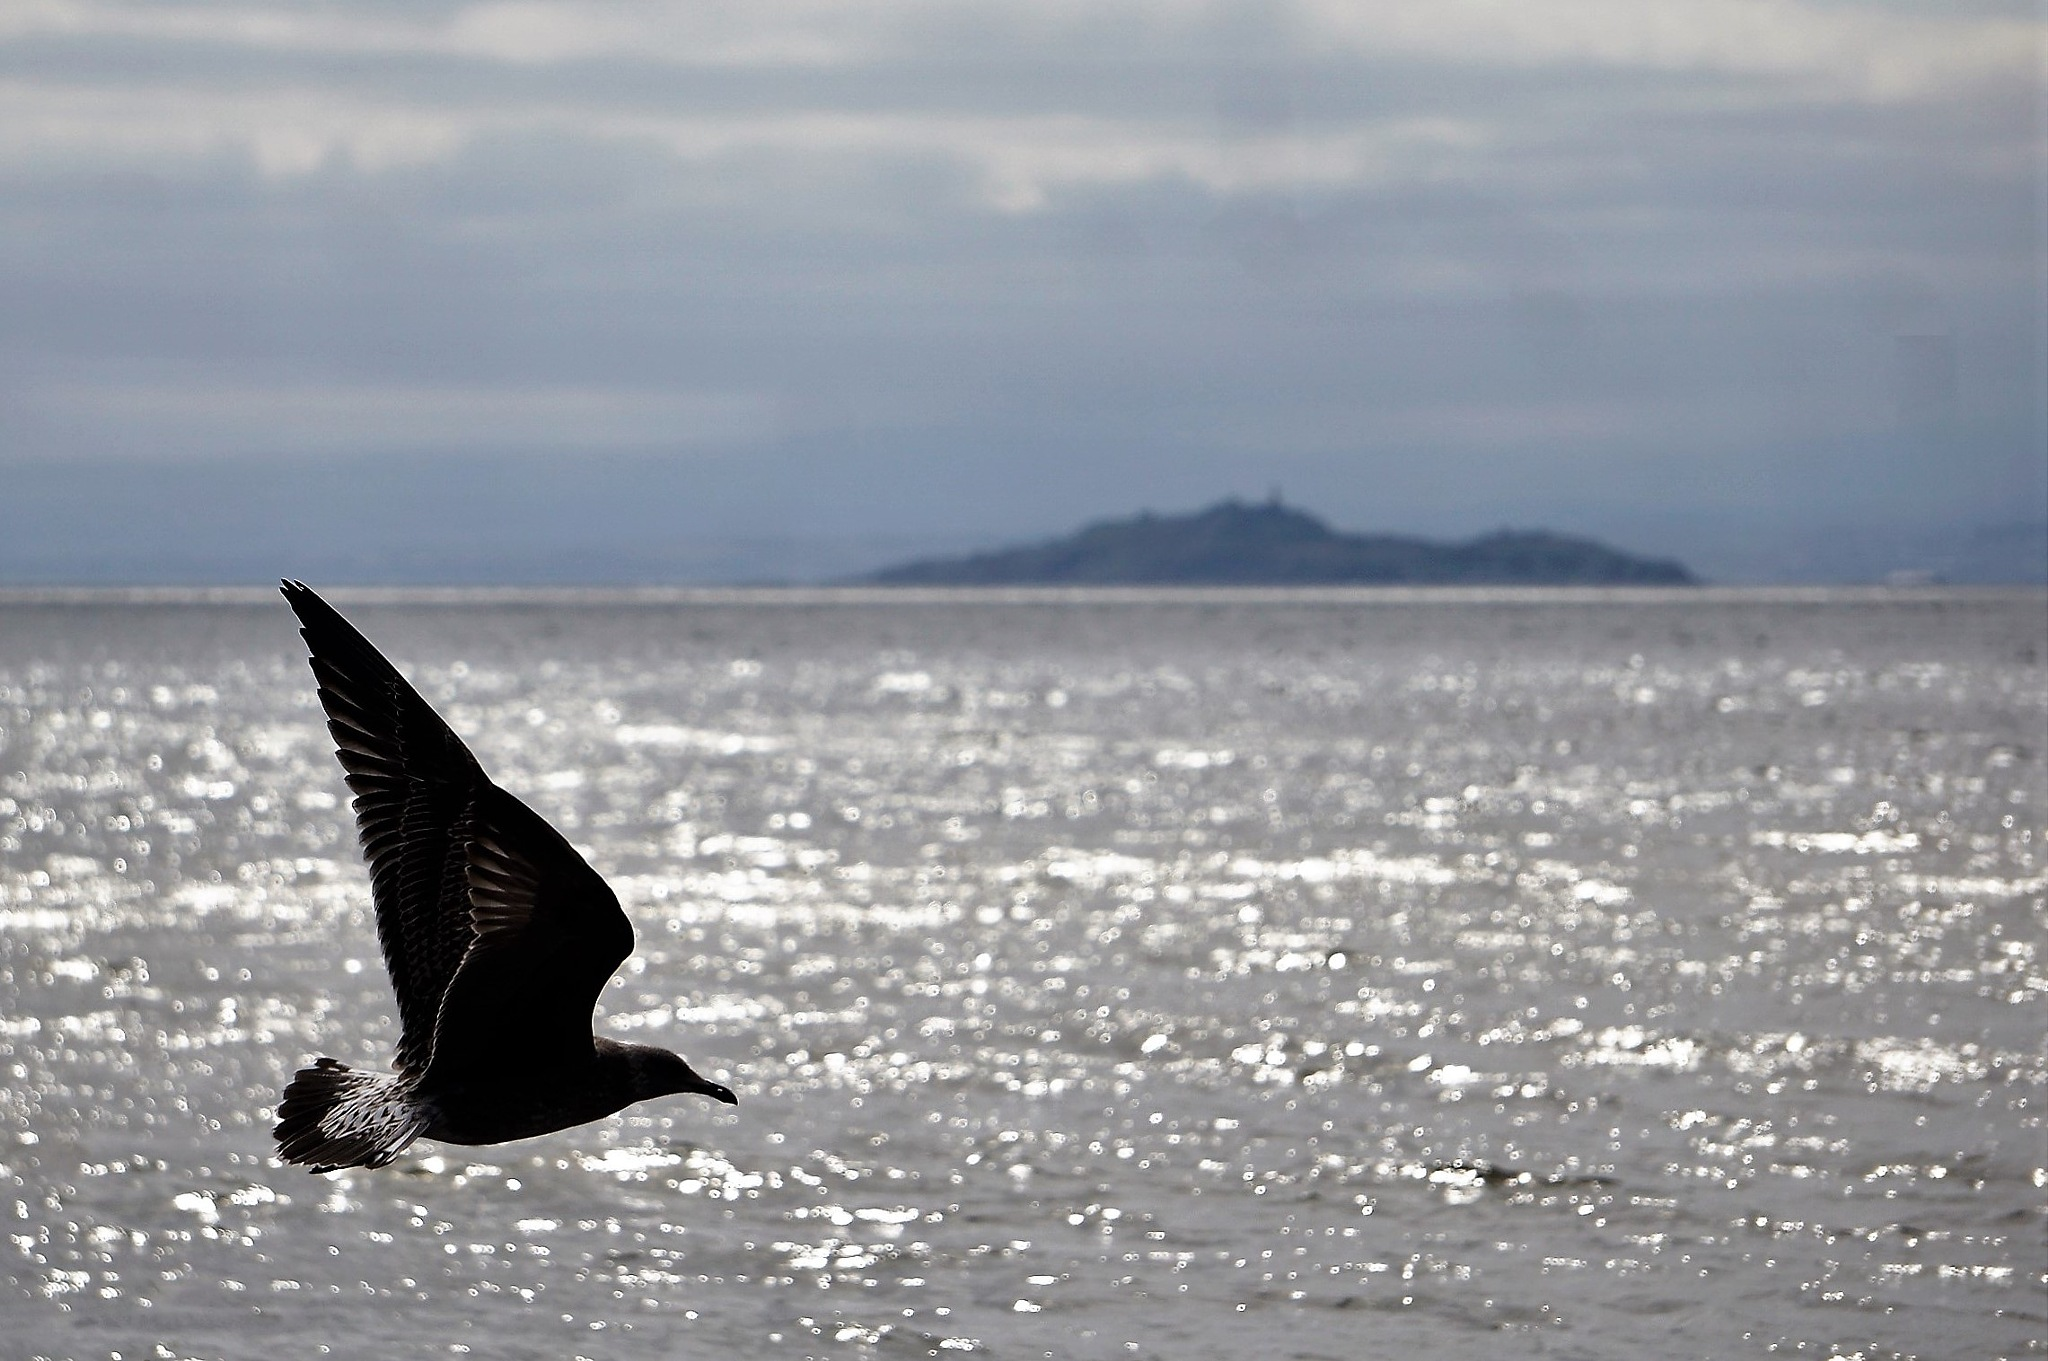 """Gull Flight"" by Thania Wehmeyer"